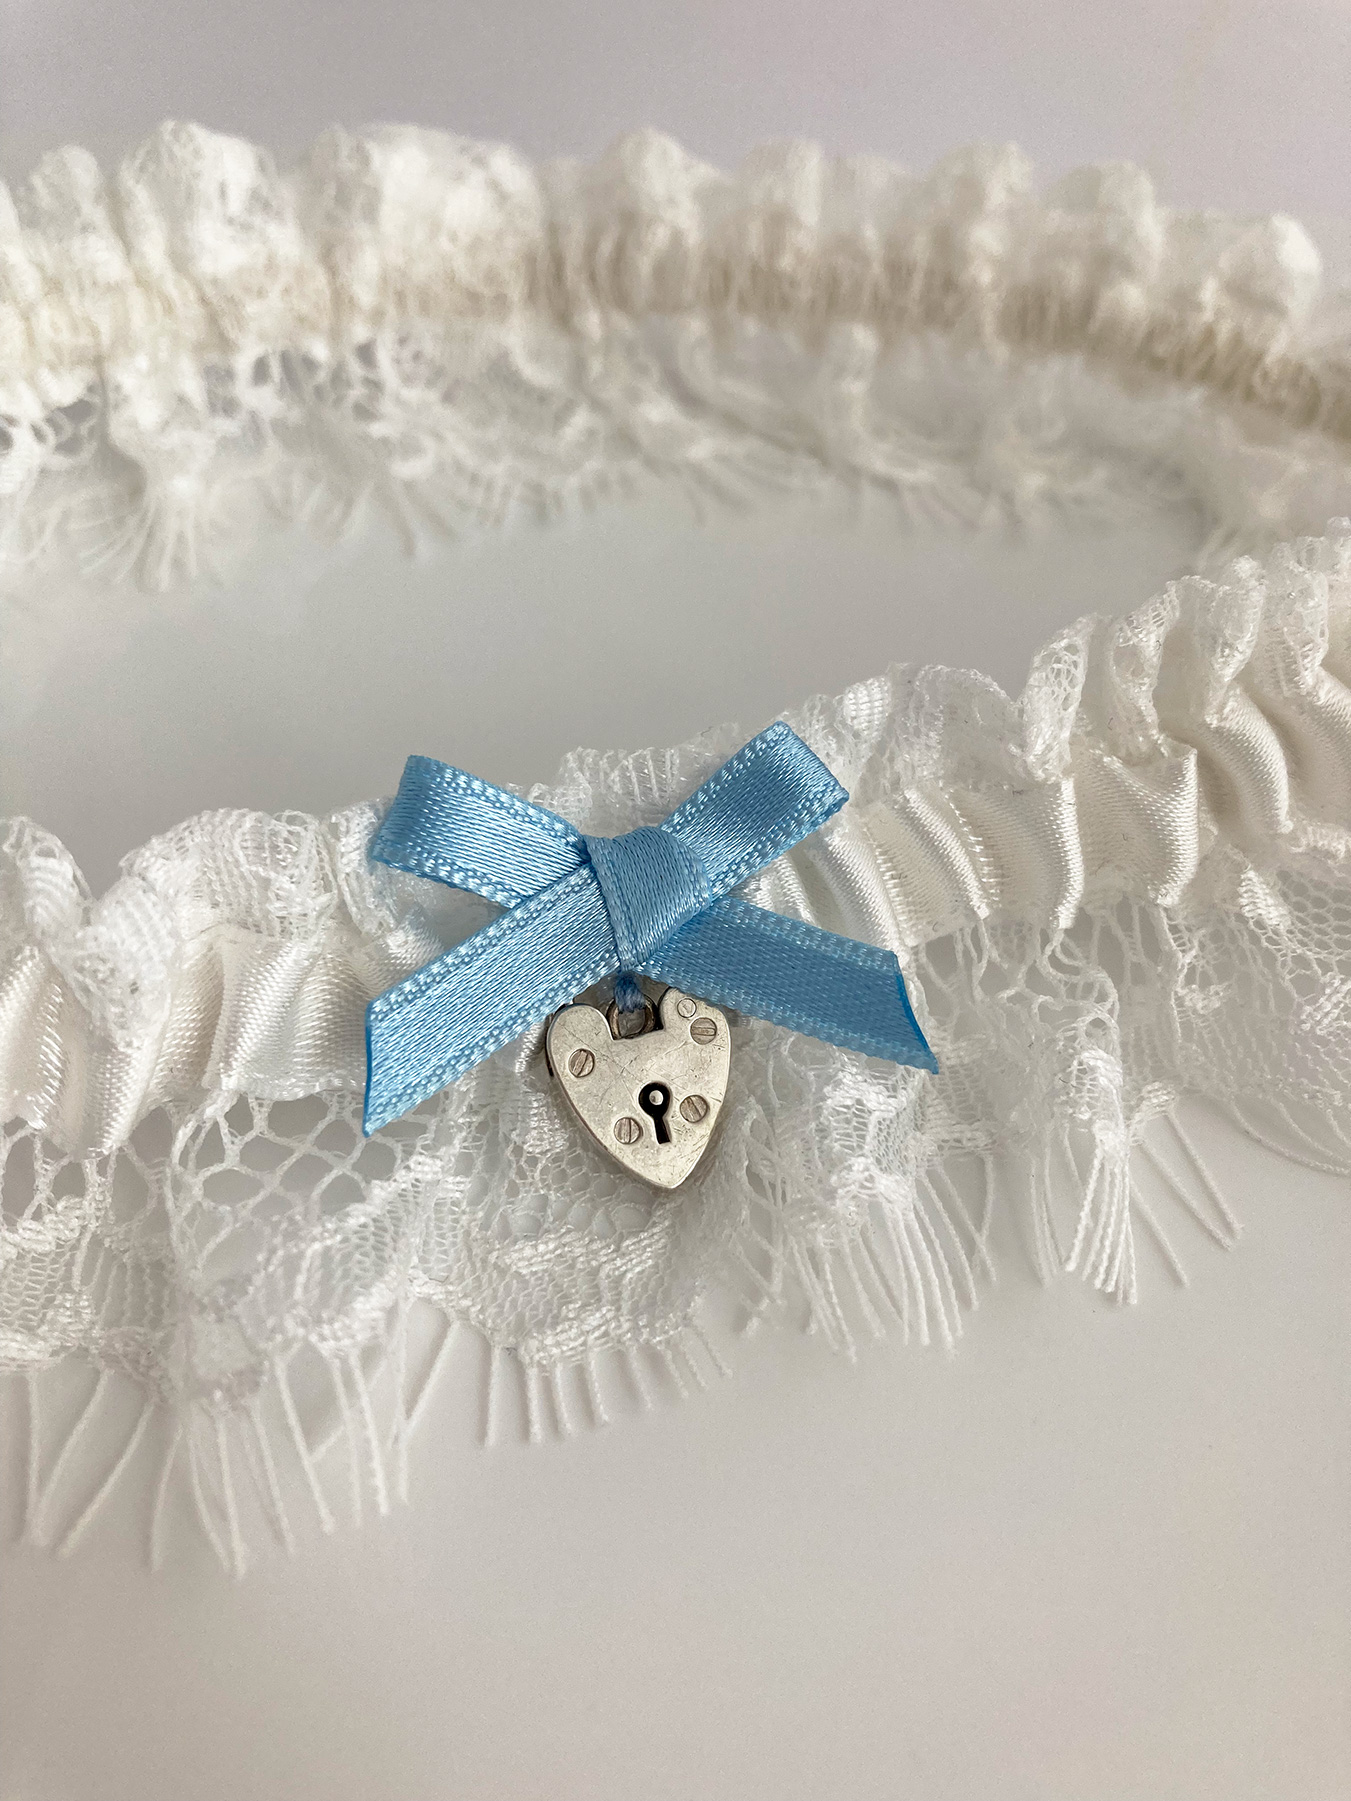 Offwhite kousenband met zilveren hart slotje